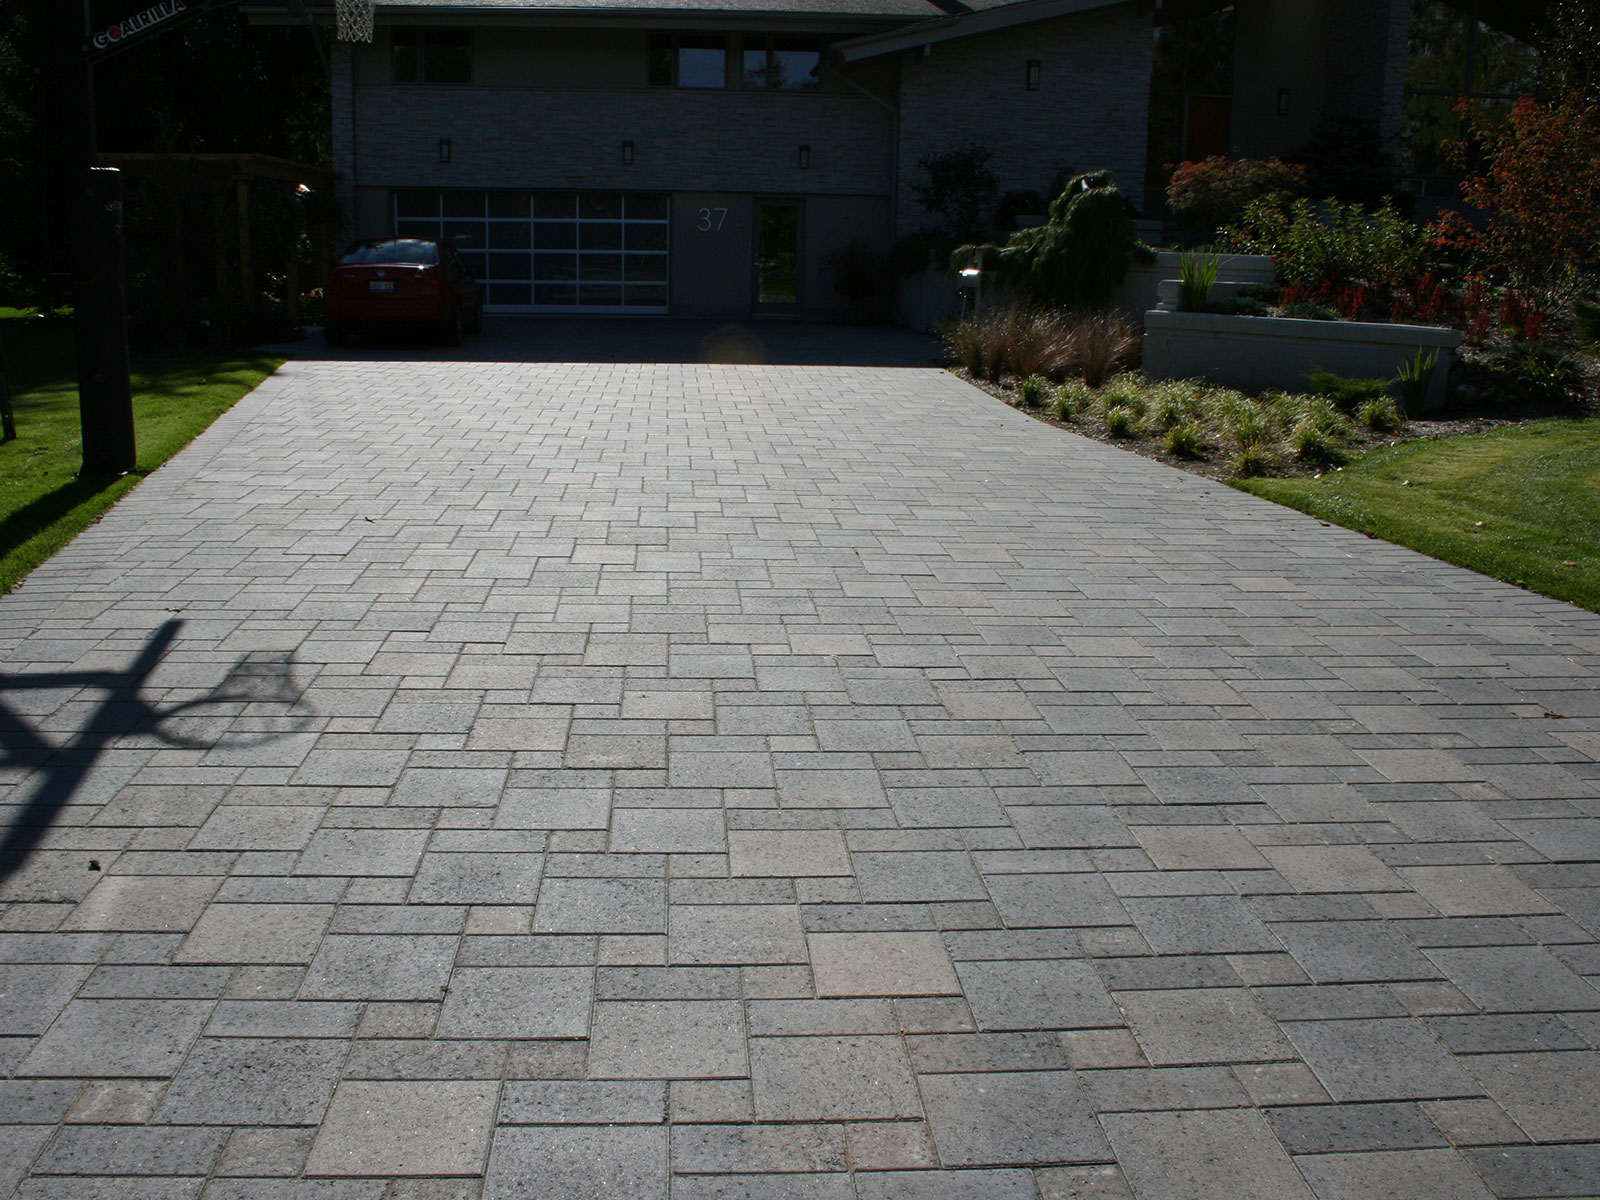 Unilock Europaver Concrete Paver Driveway